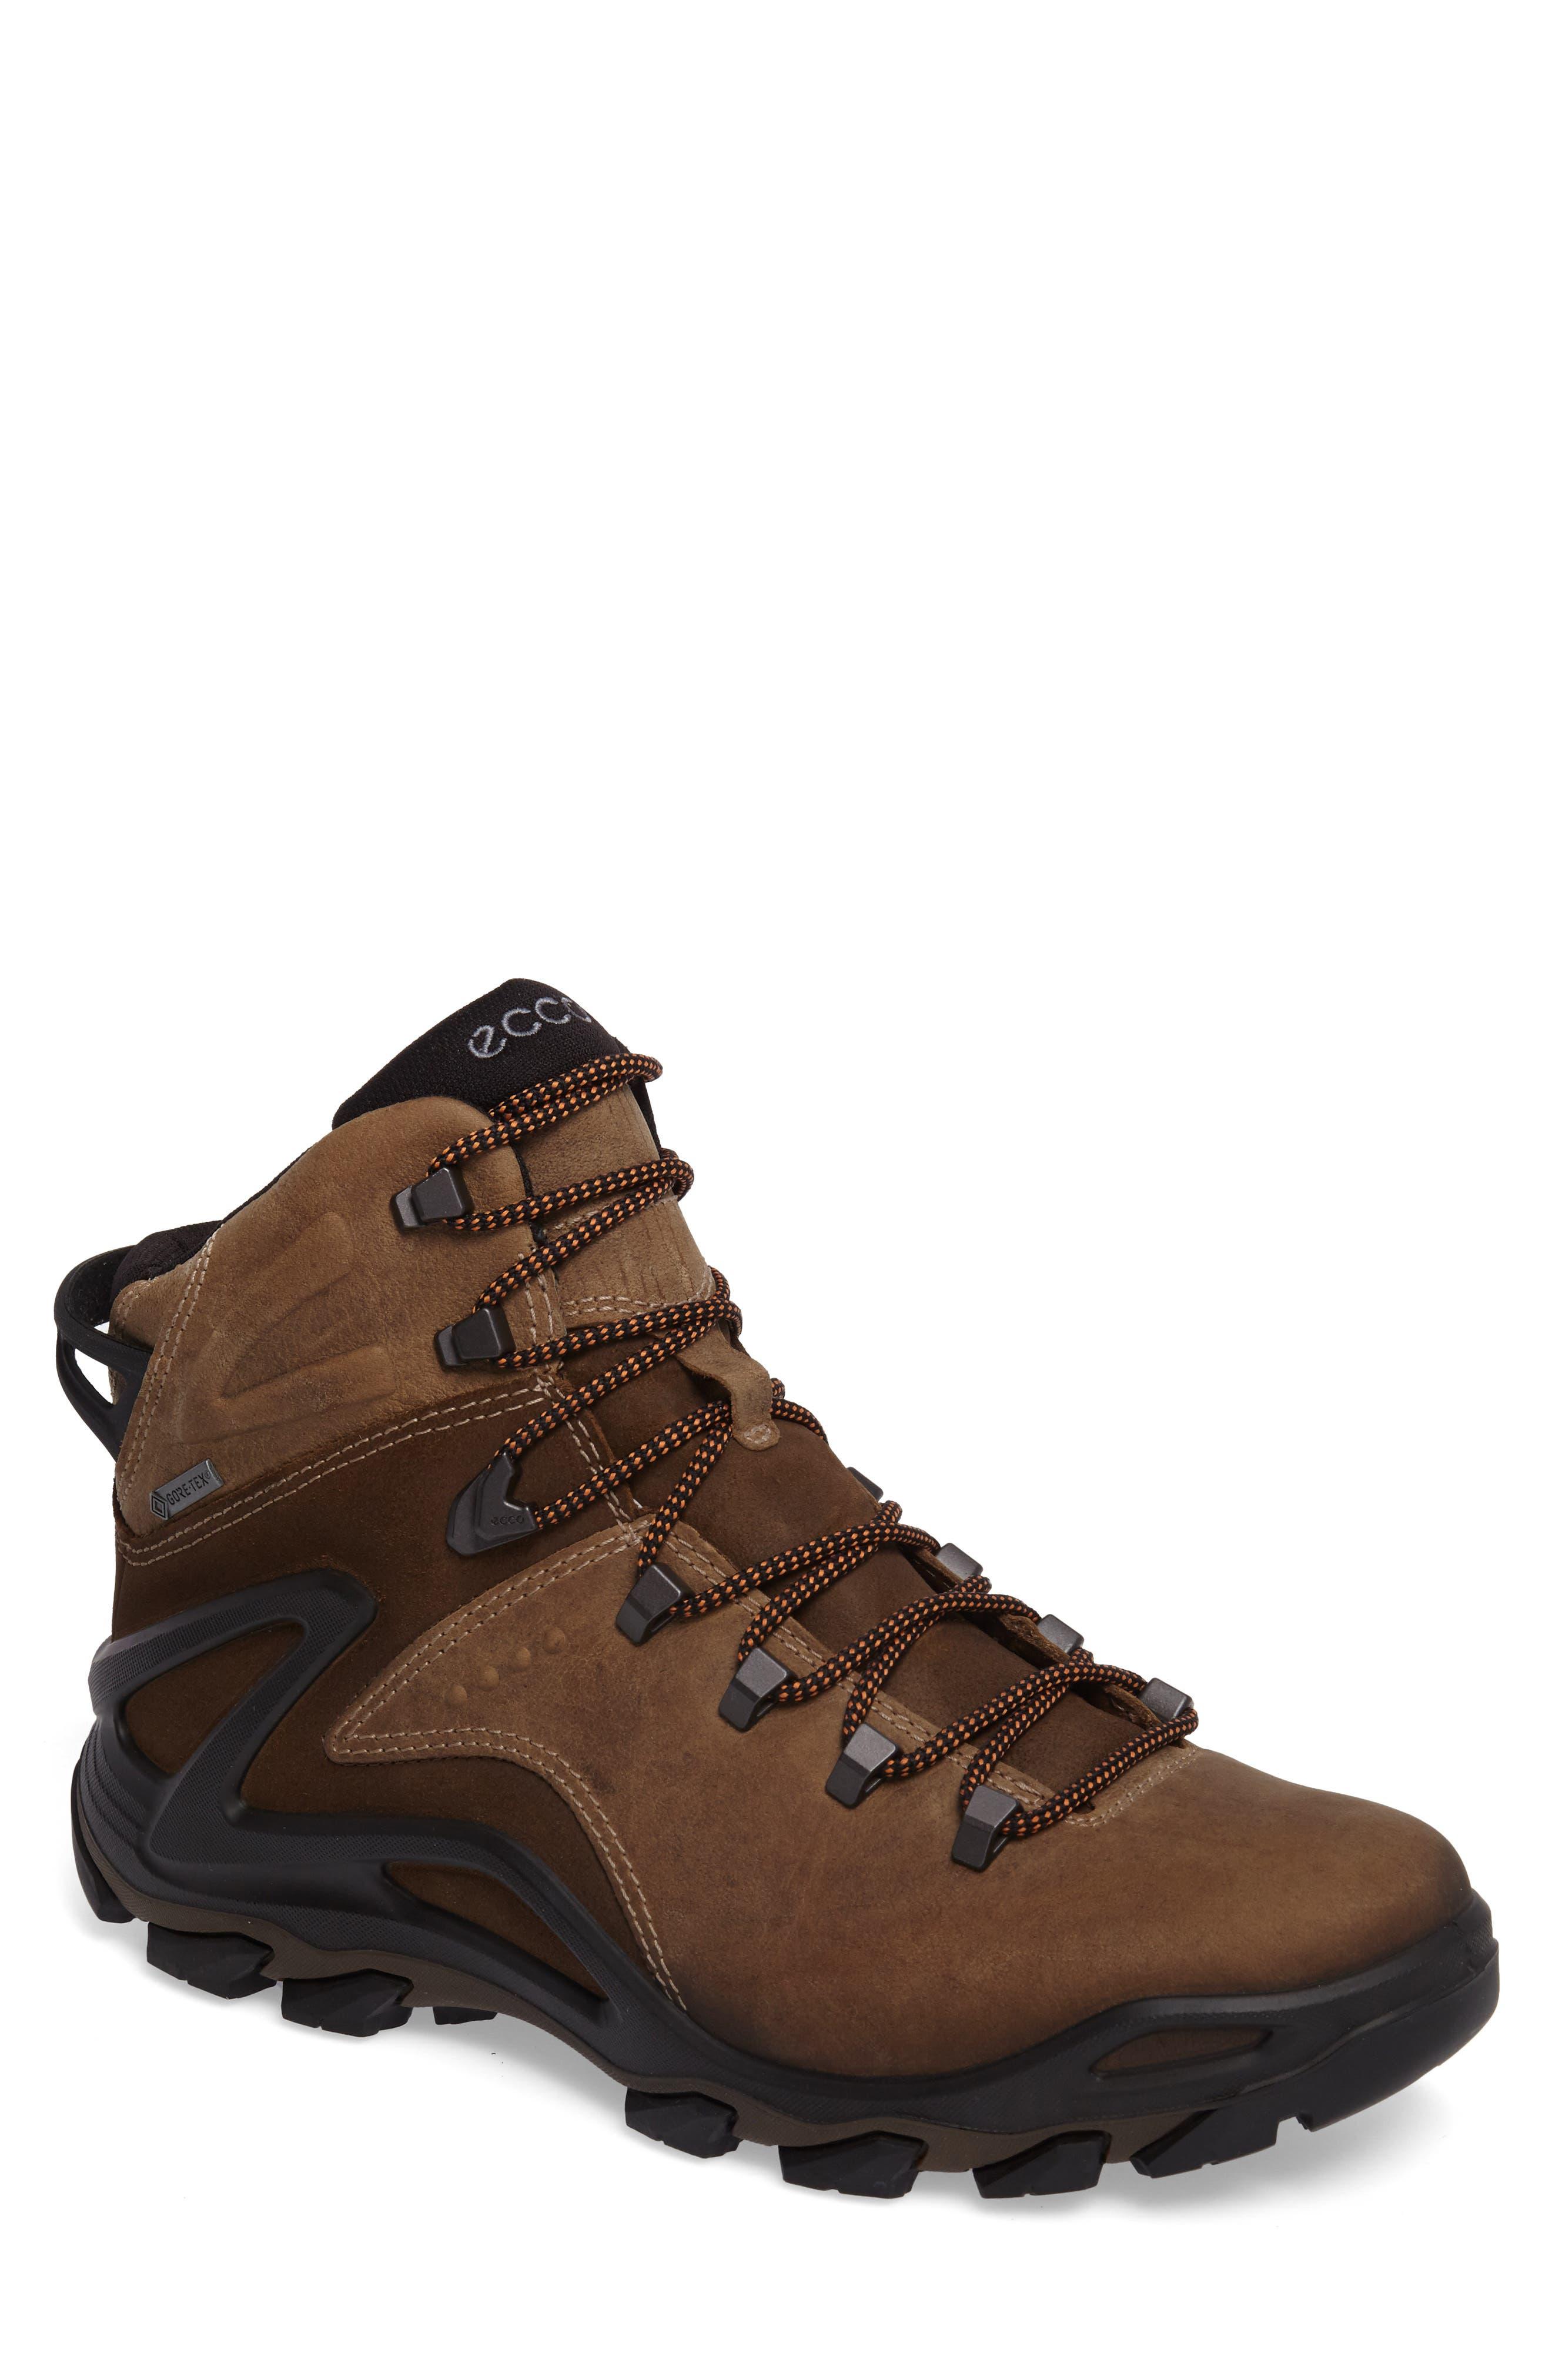 Terra Evo GTX Mid Hiking Boot,                         Main,                         color, MOON ROCK NUBUCK/ SUEDE